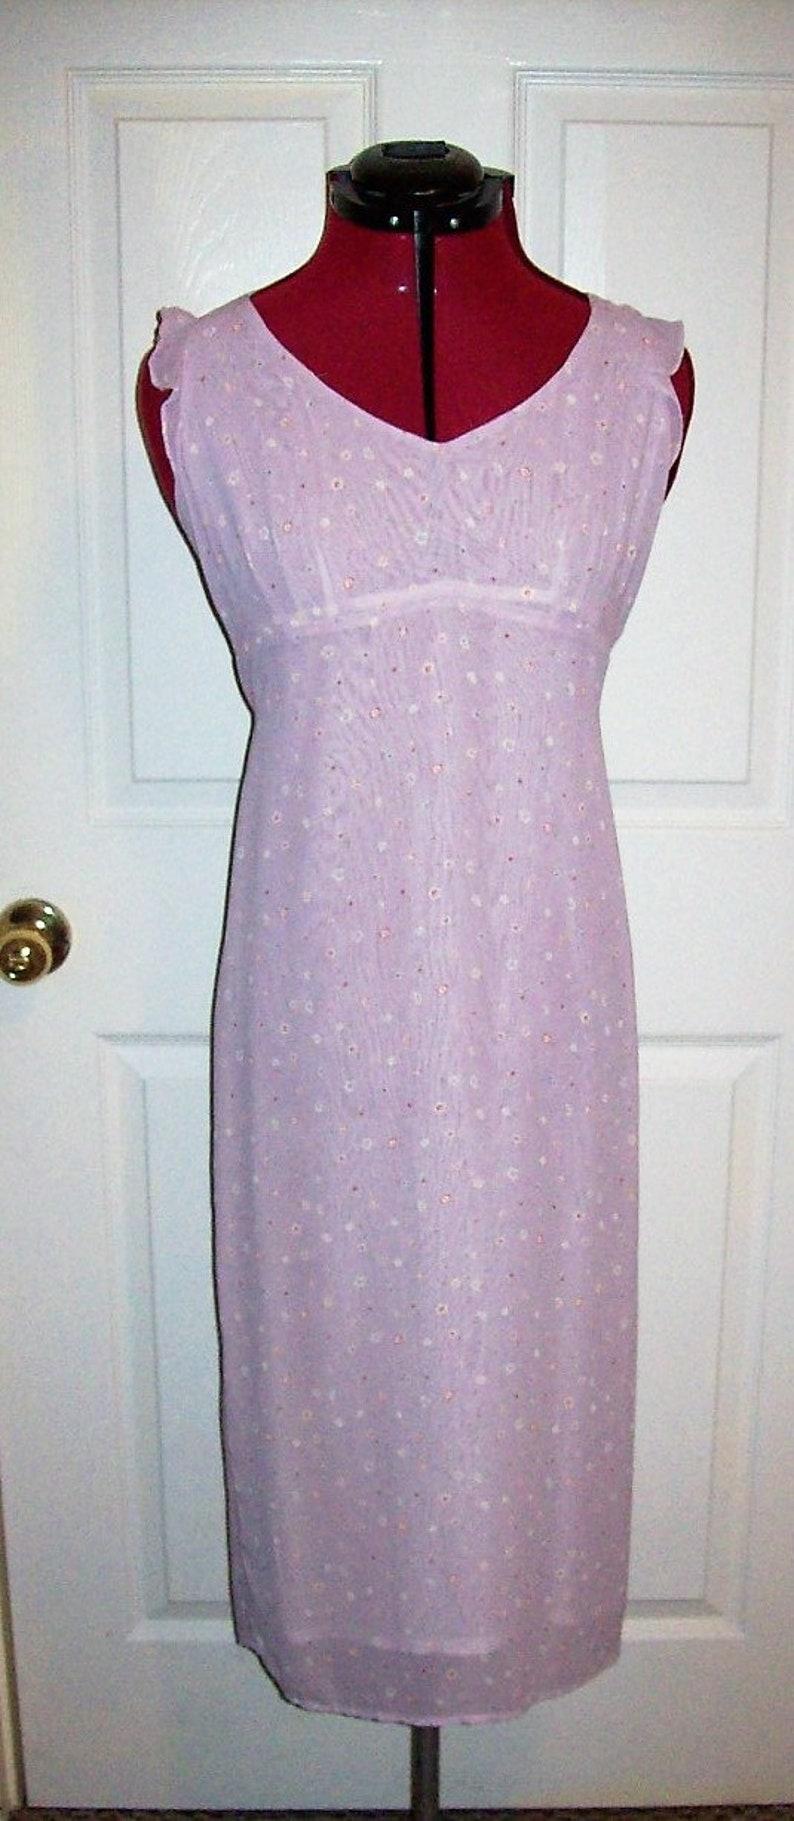 Vintage Ladies Lavender Purple Floral Print Sleeveless Chiffon Dress by Tessuto Size 6 Only 6 USD